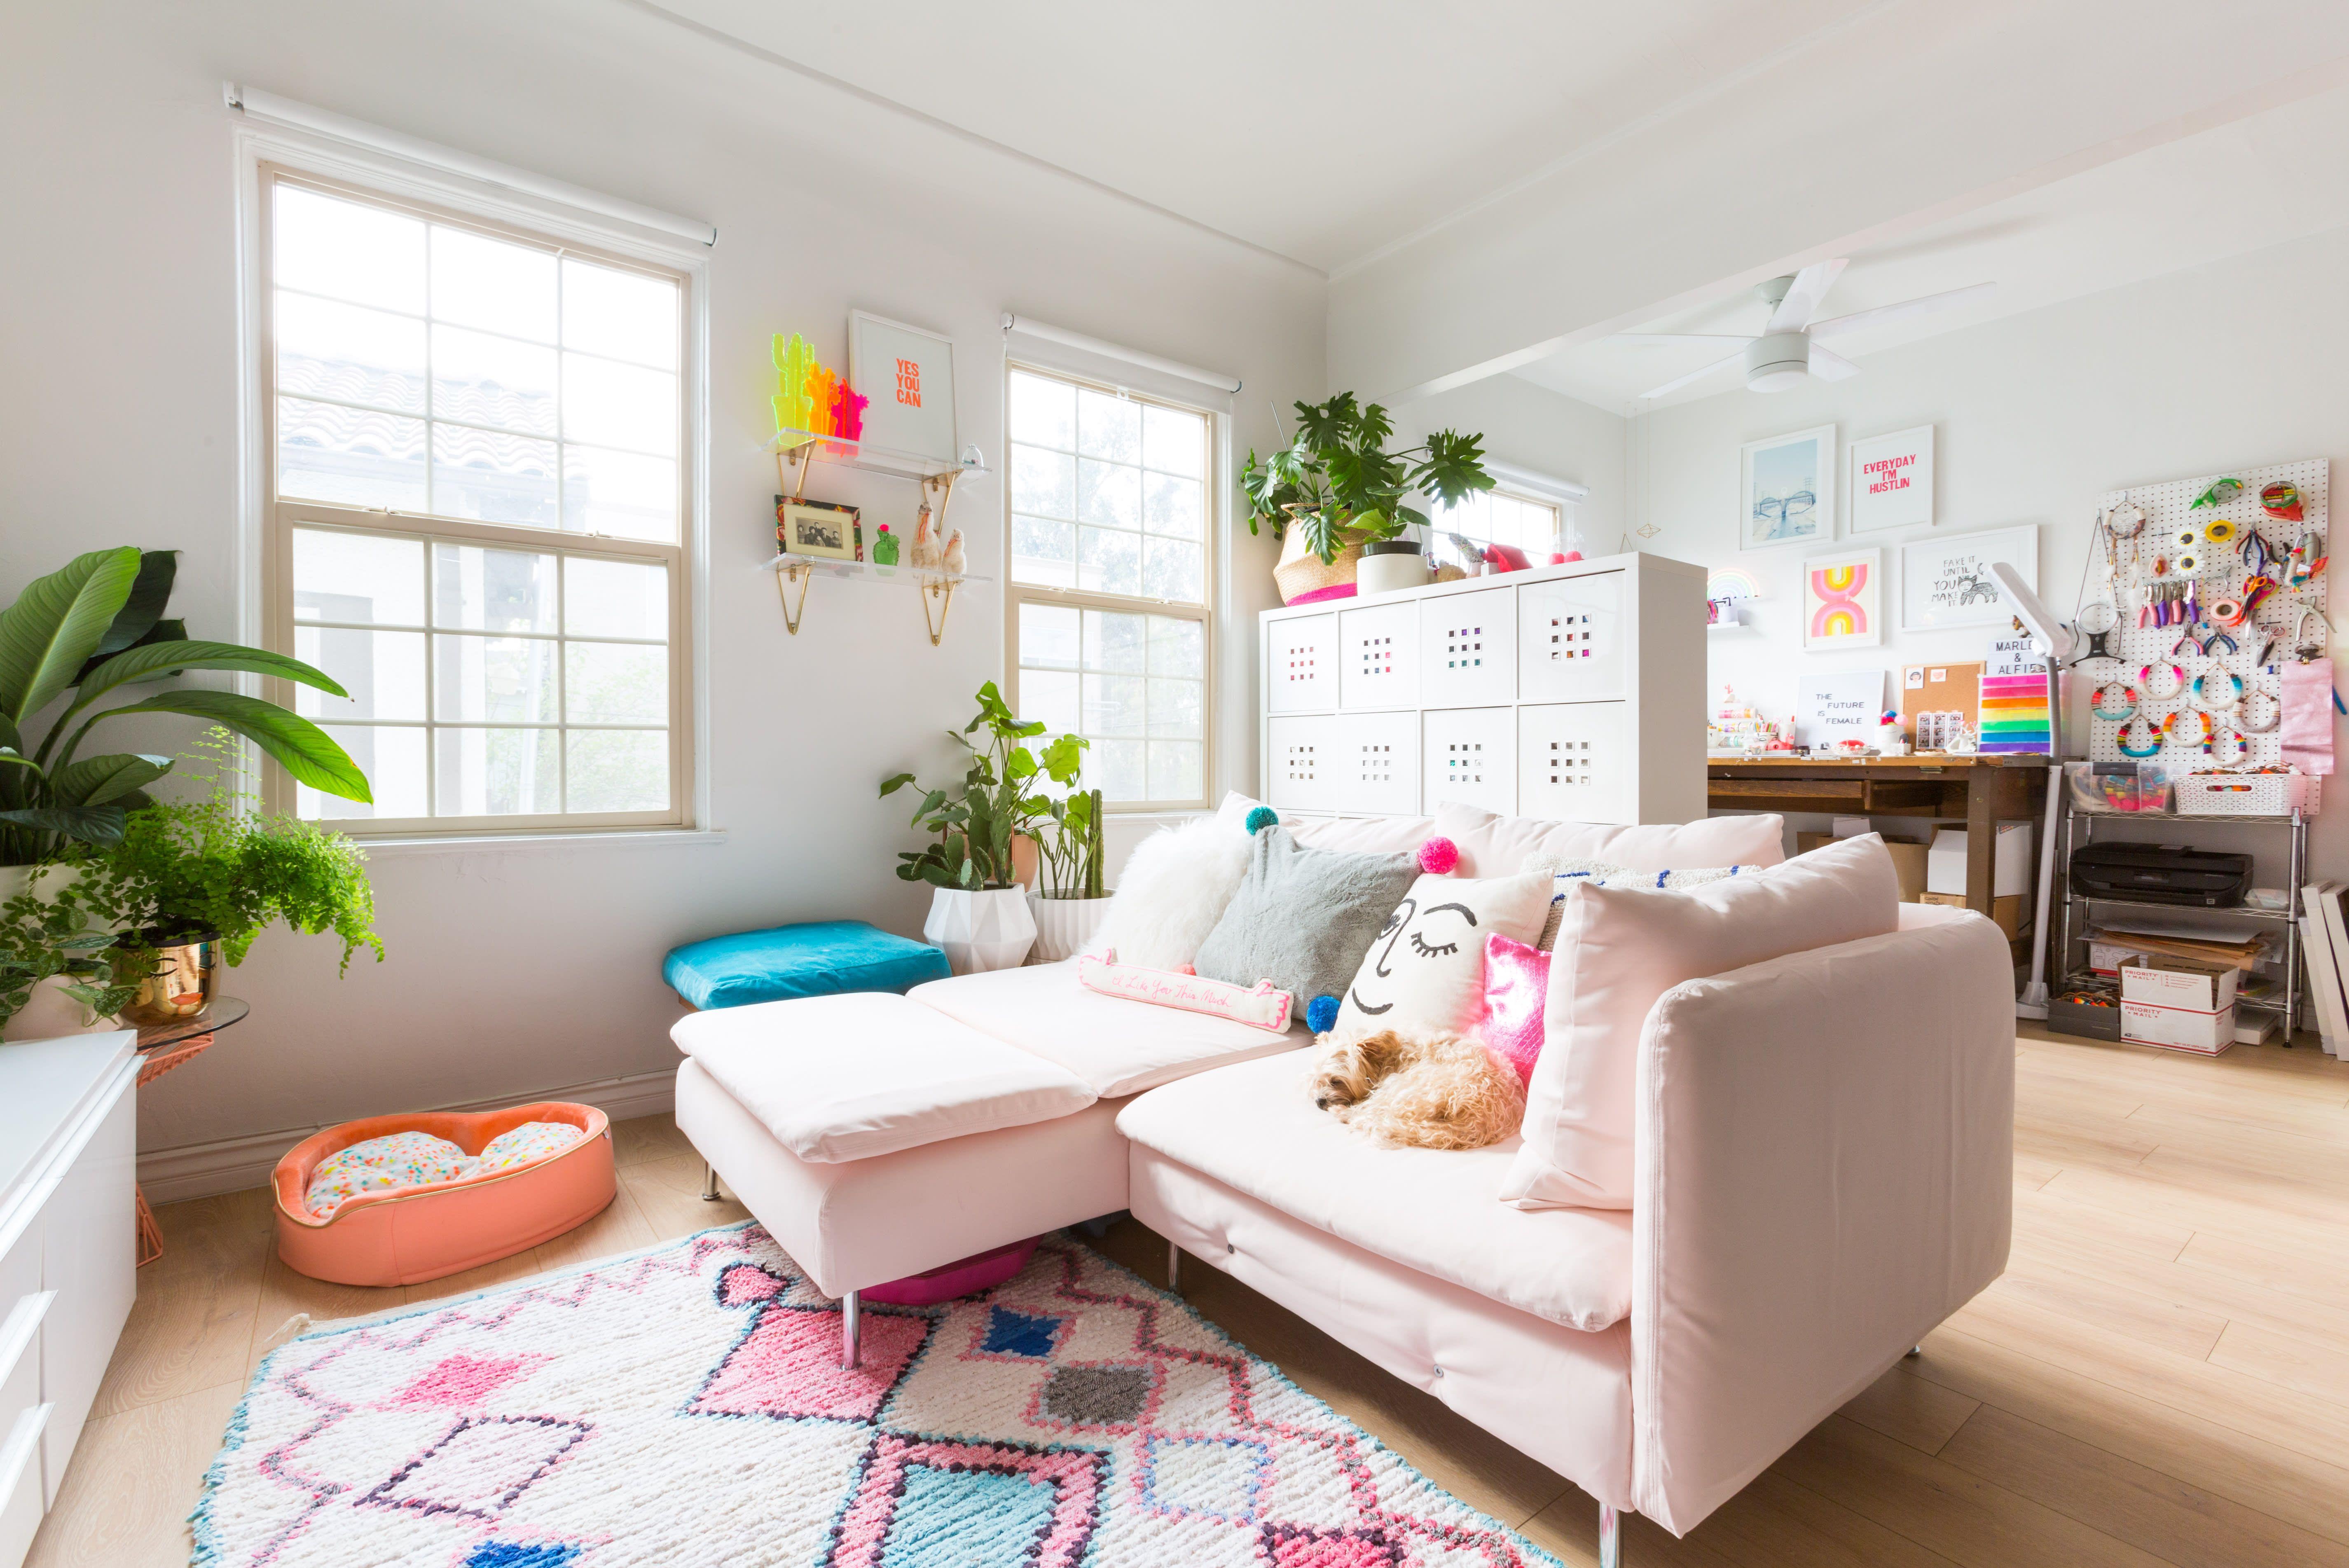 A Playful Rainbow Hued La Studio Apartment Is Tiny But Well Designed Studio Apartment Design Small Room Design Apartment Furniture